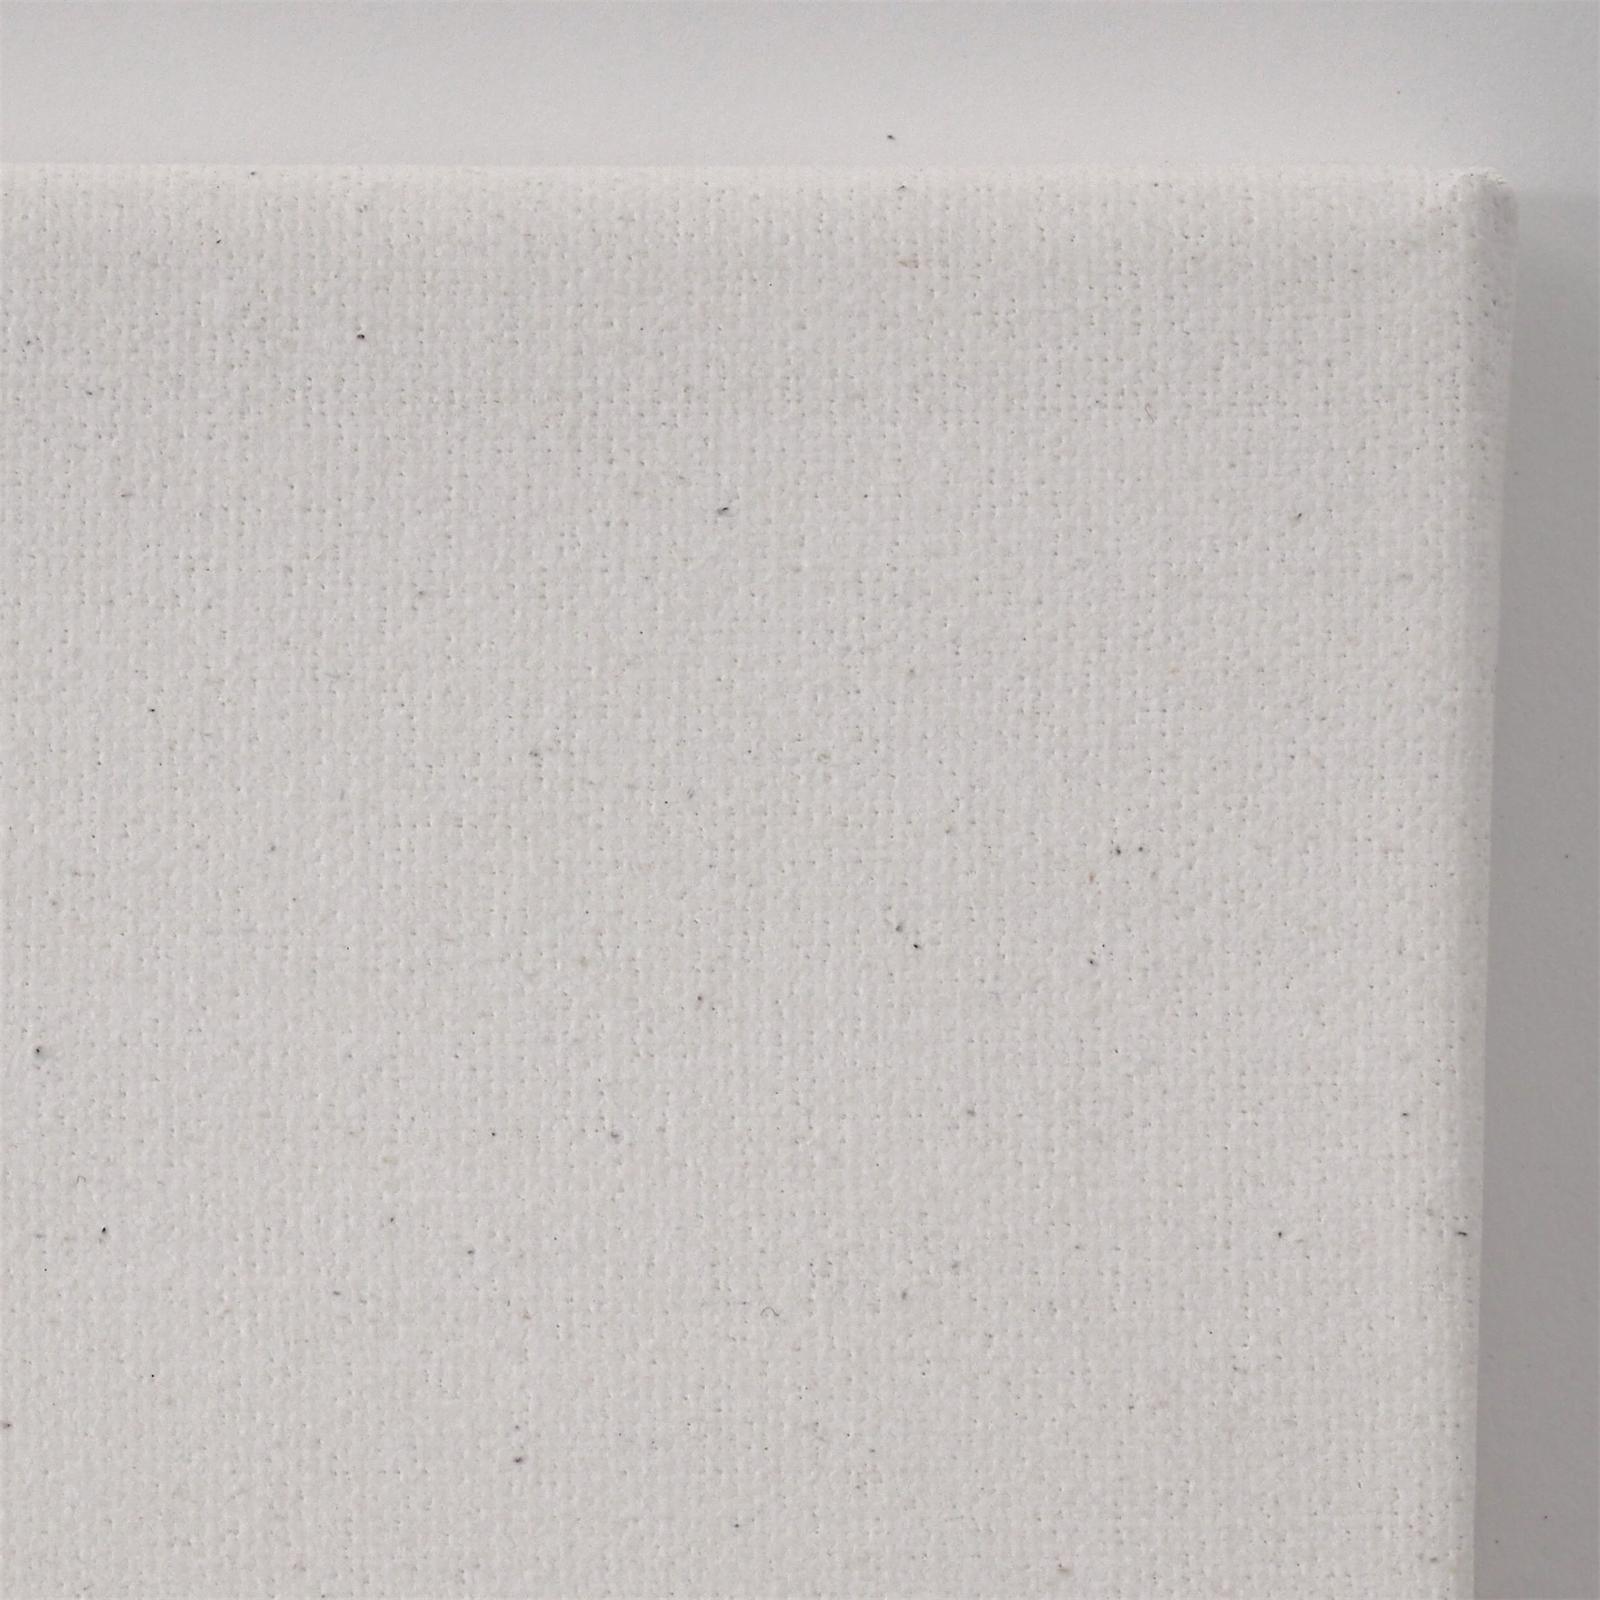 6 leinw nde auf keilrahmen 20x70 cm k nstler leinwand set ebay. Black Bedroom Furniture Sets. Home Design Ideas